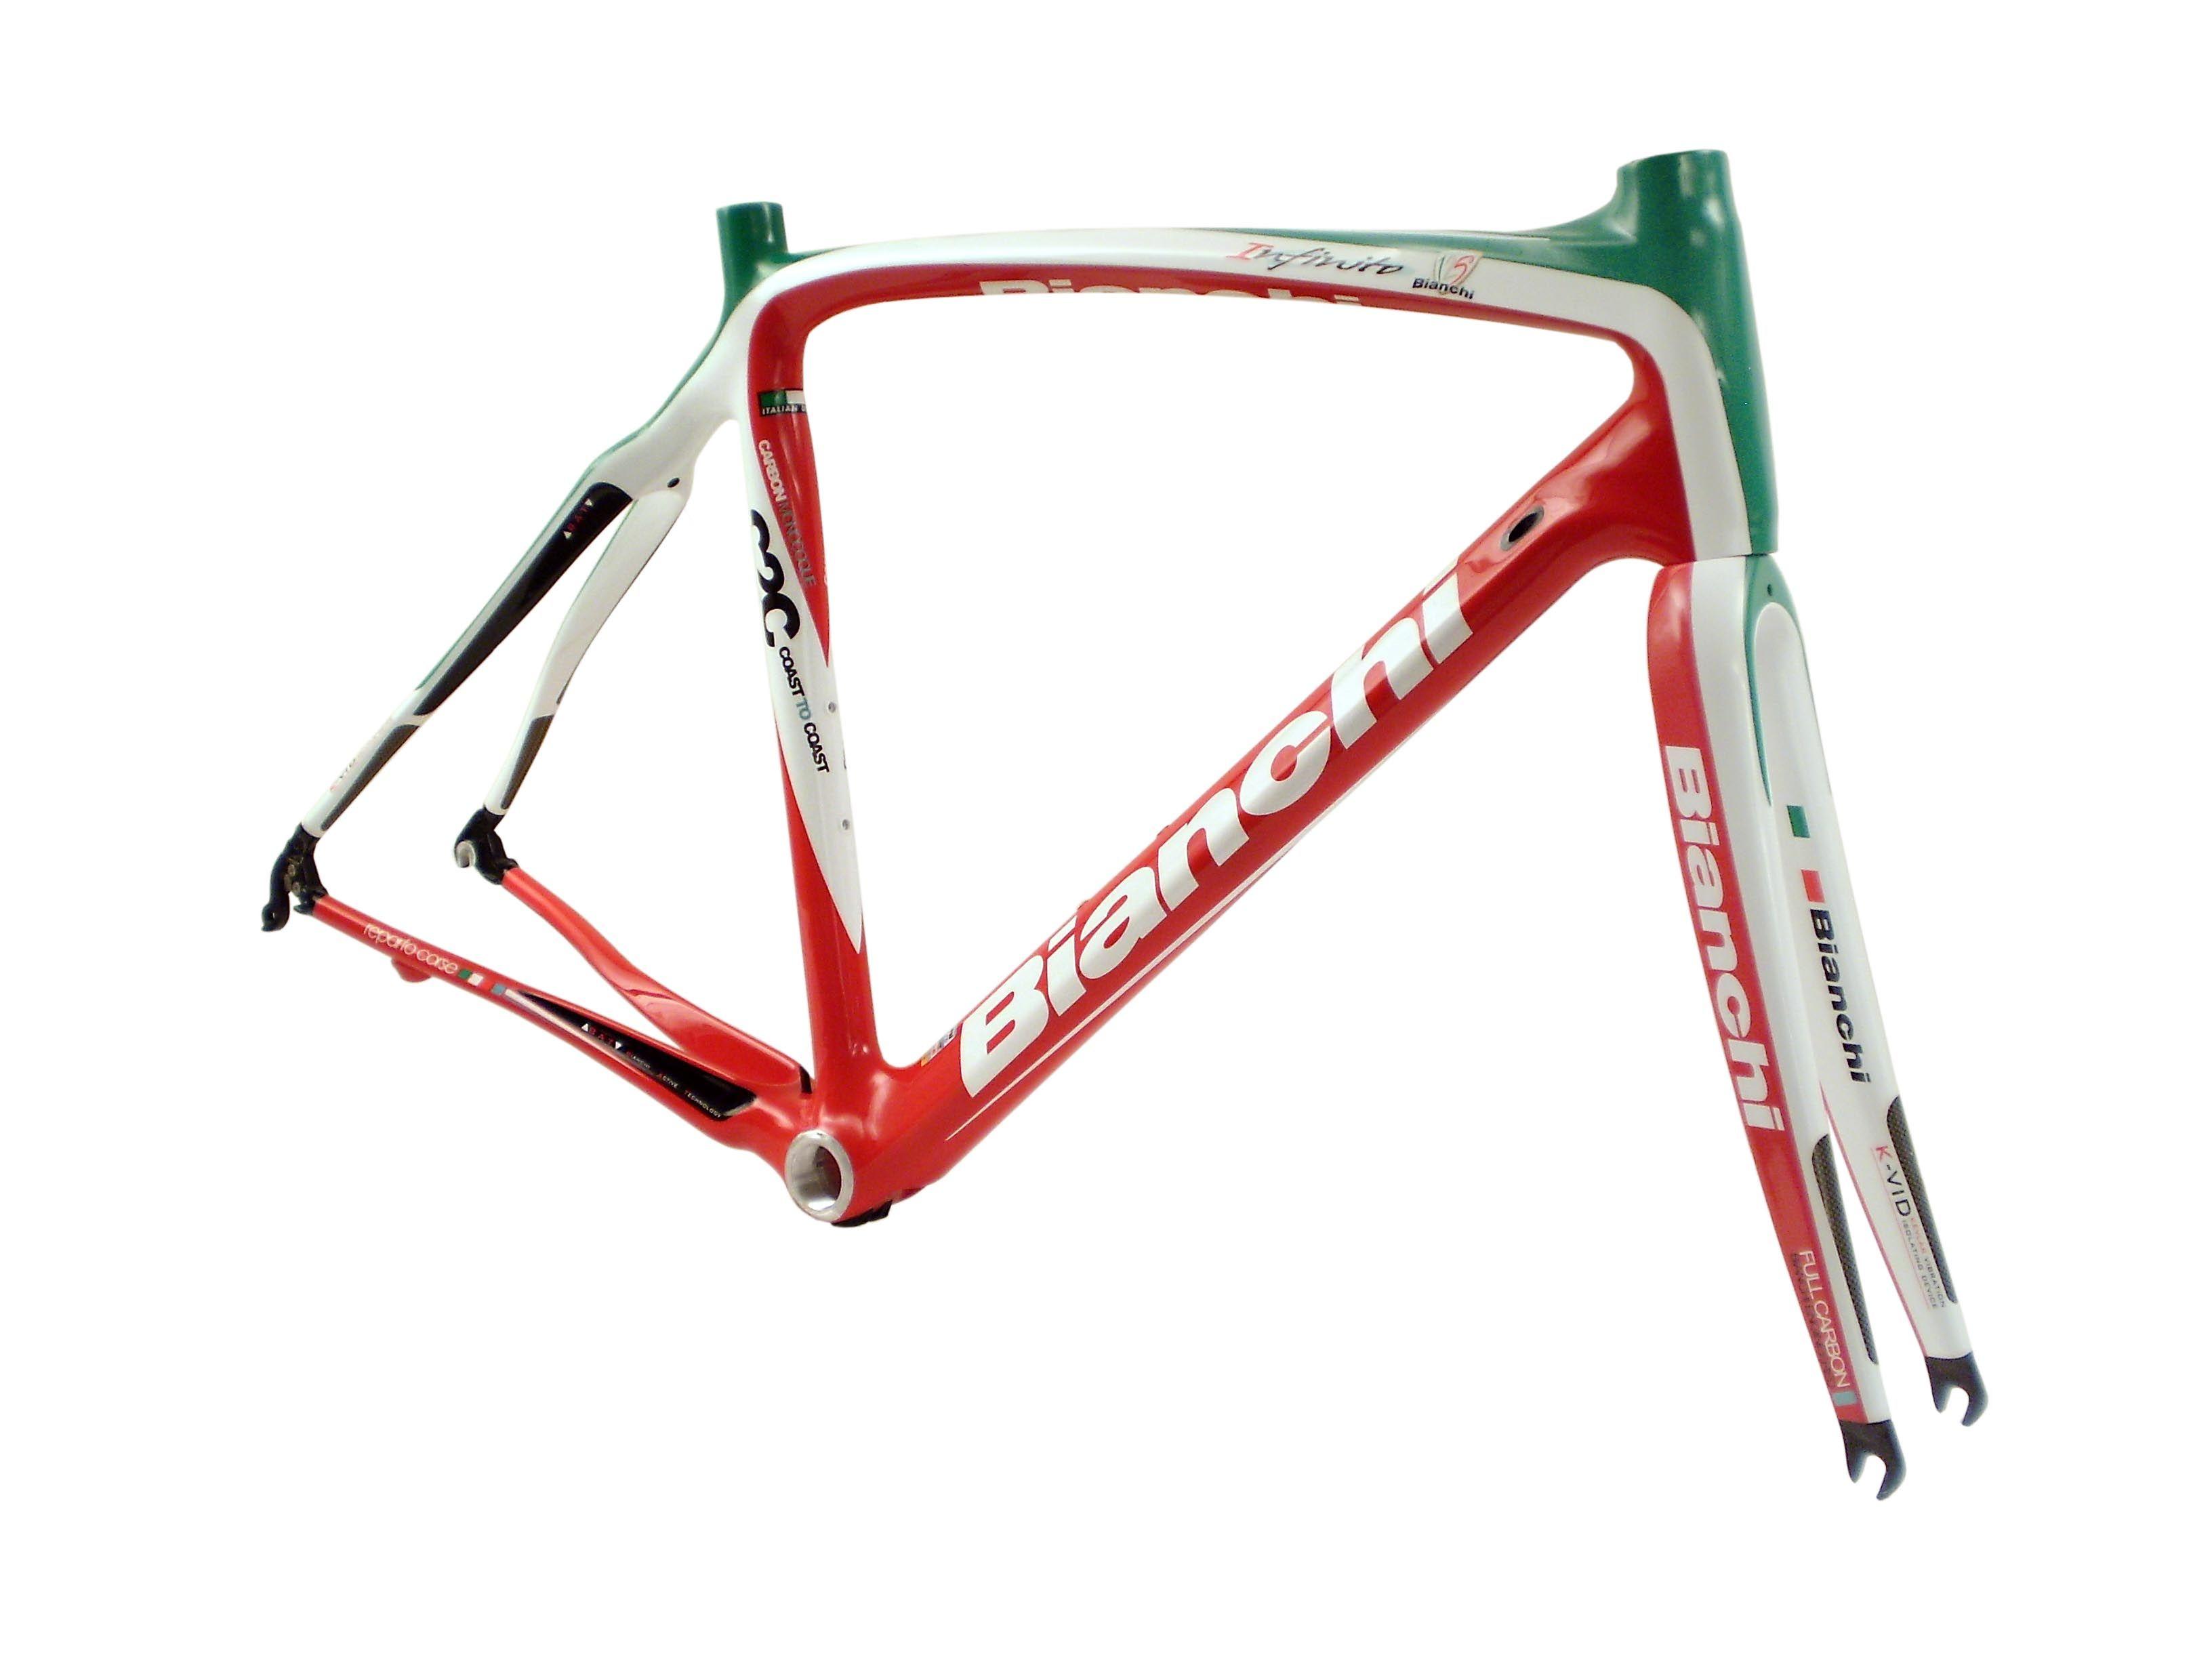 Bianchi Infinito limited versie !